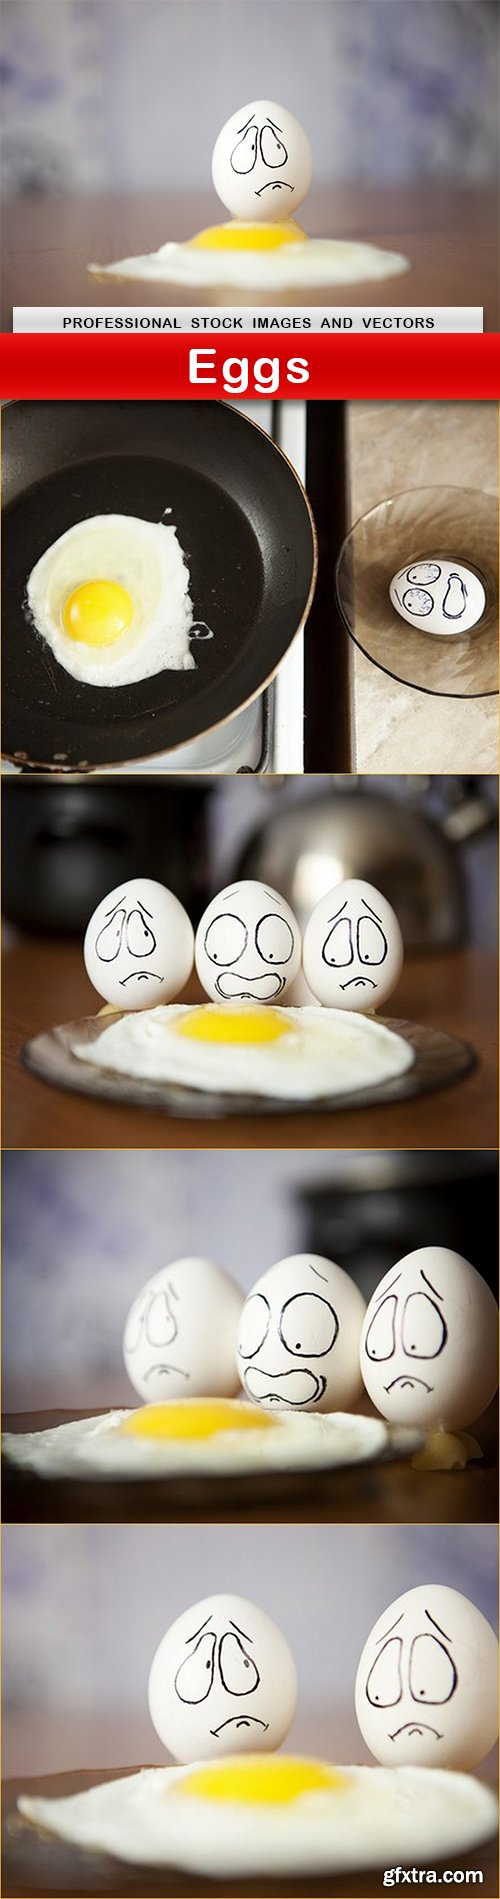 Eggs - 5 UHQ JPEG